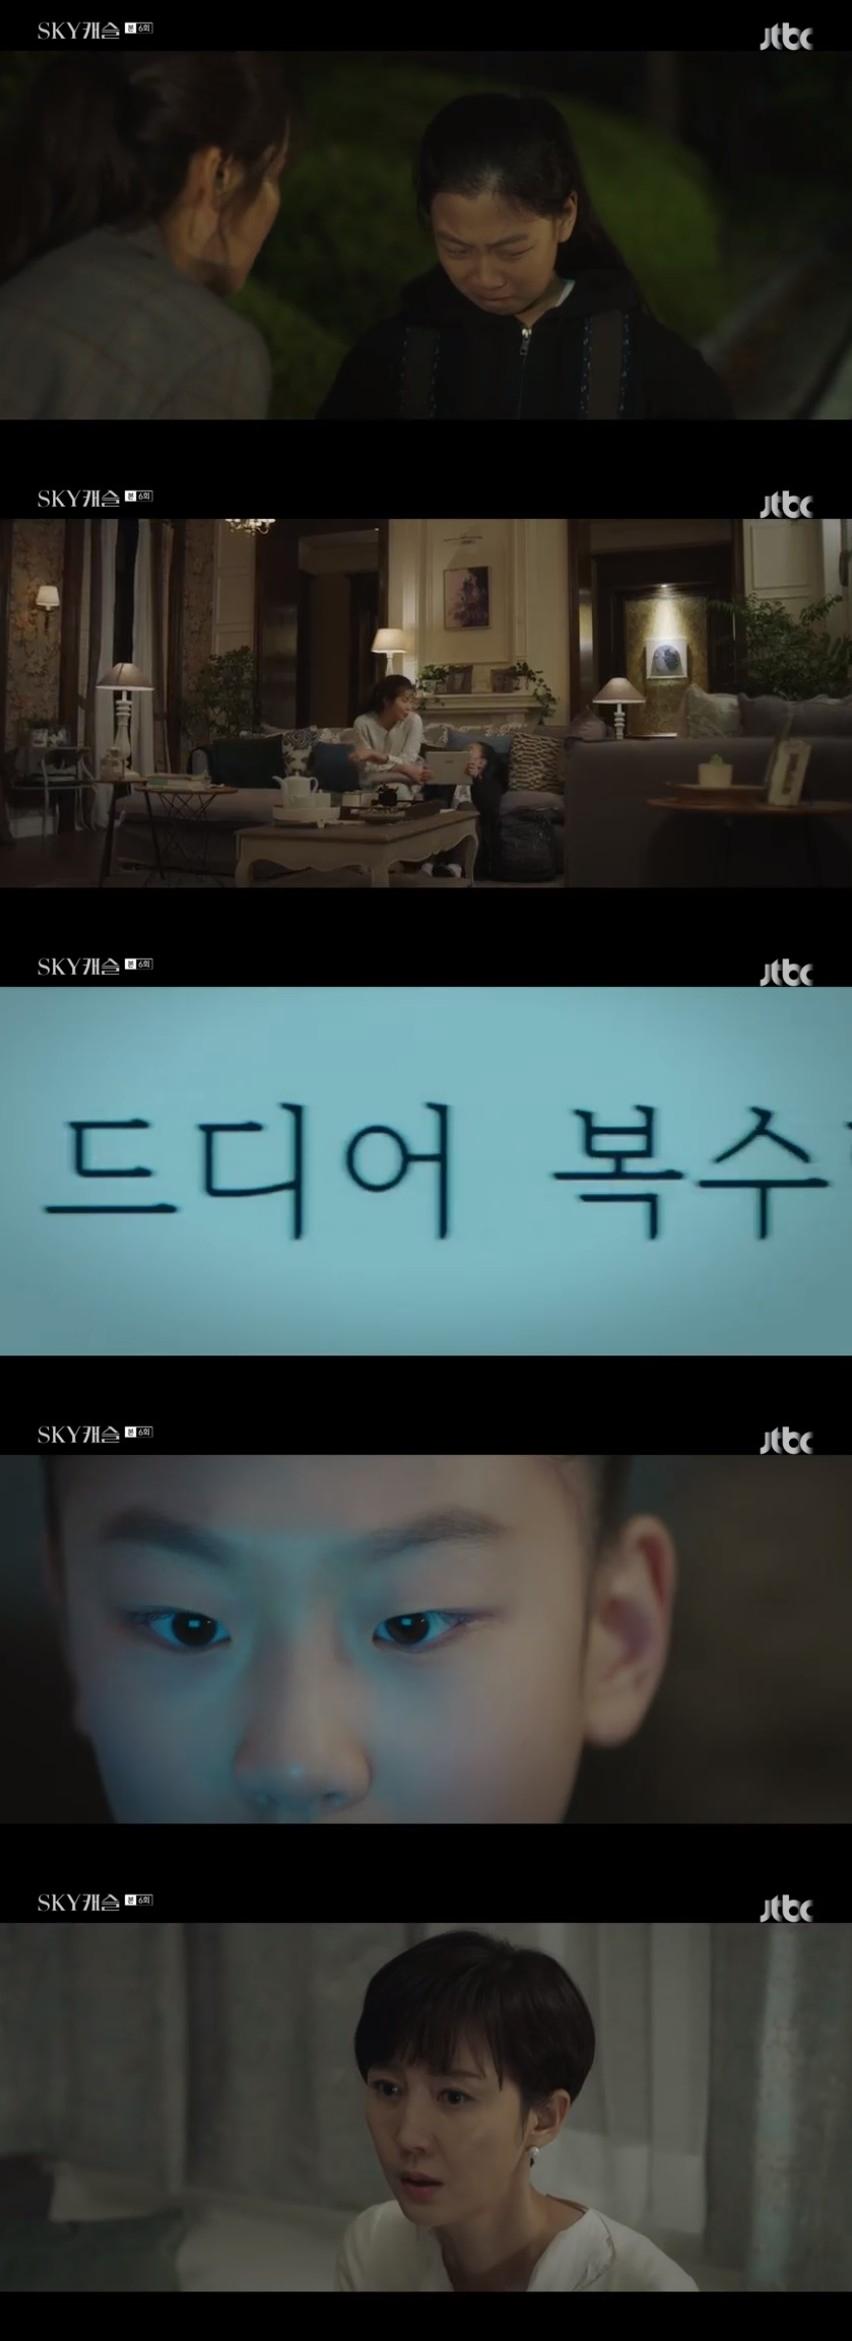 'SKY 캐슬' 염정아 딸x이태란, 문제의 송건희 일기 발견 '충격'(종합)